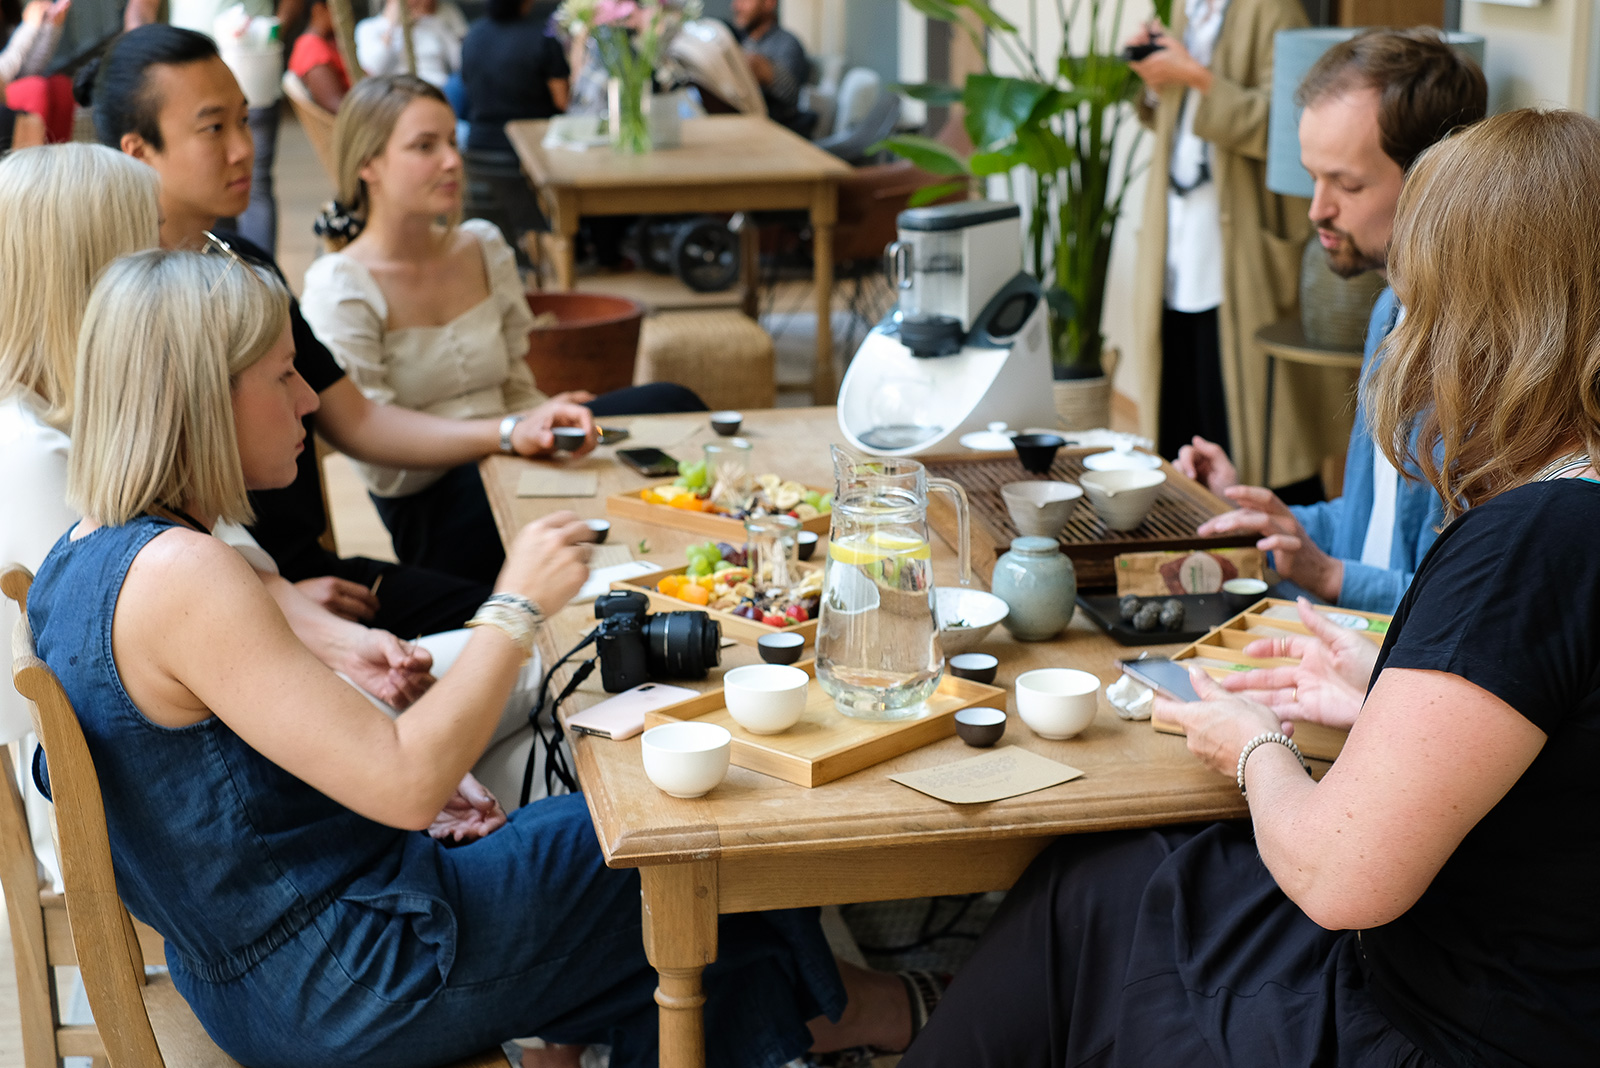 Temial Bollger Event, Teeseminar, Teeverkostung, Tisch, Tee, Yoga, Temial, Achtsamkeit, Teafulness, Mindfulness, Lifehack